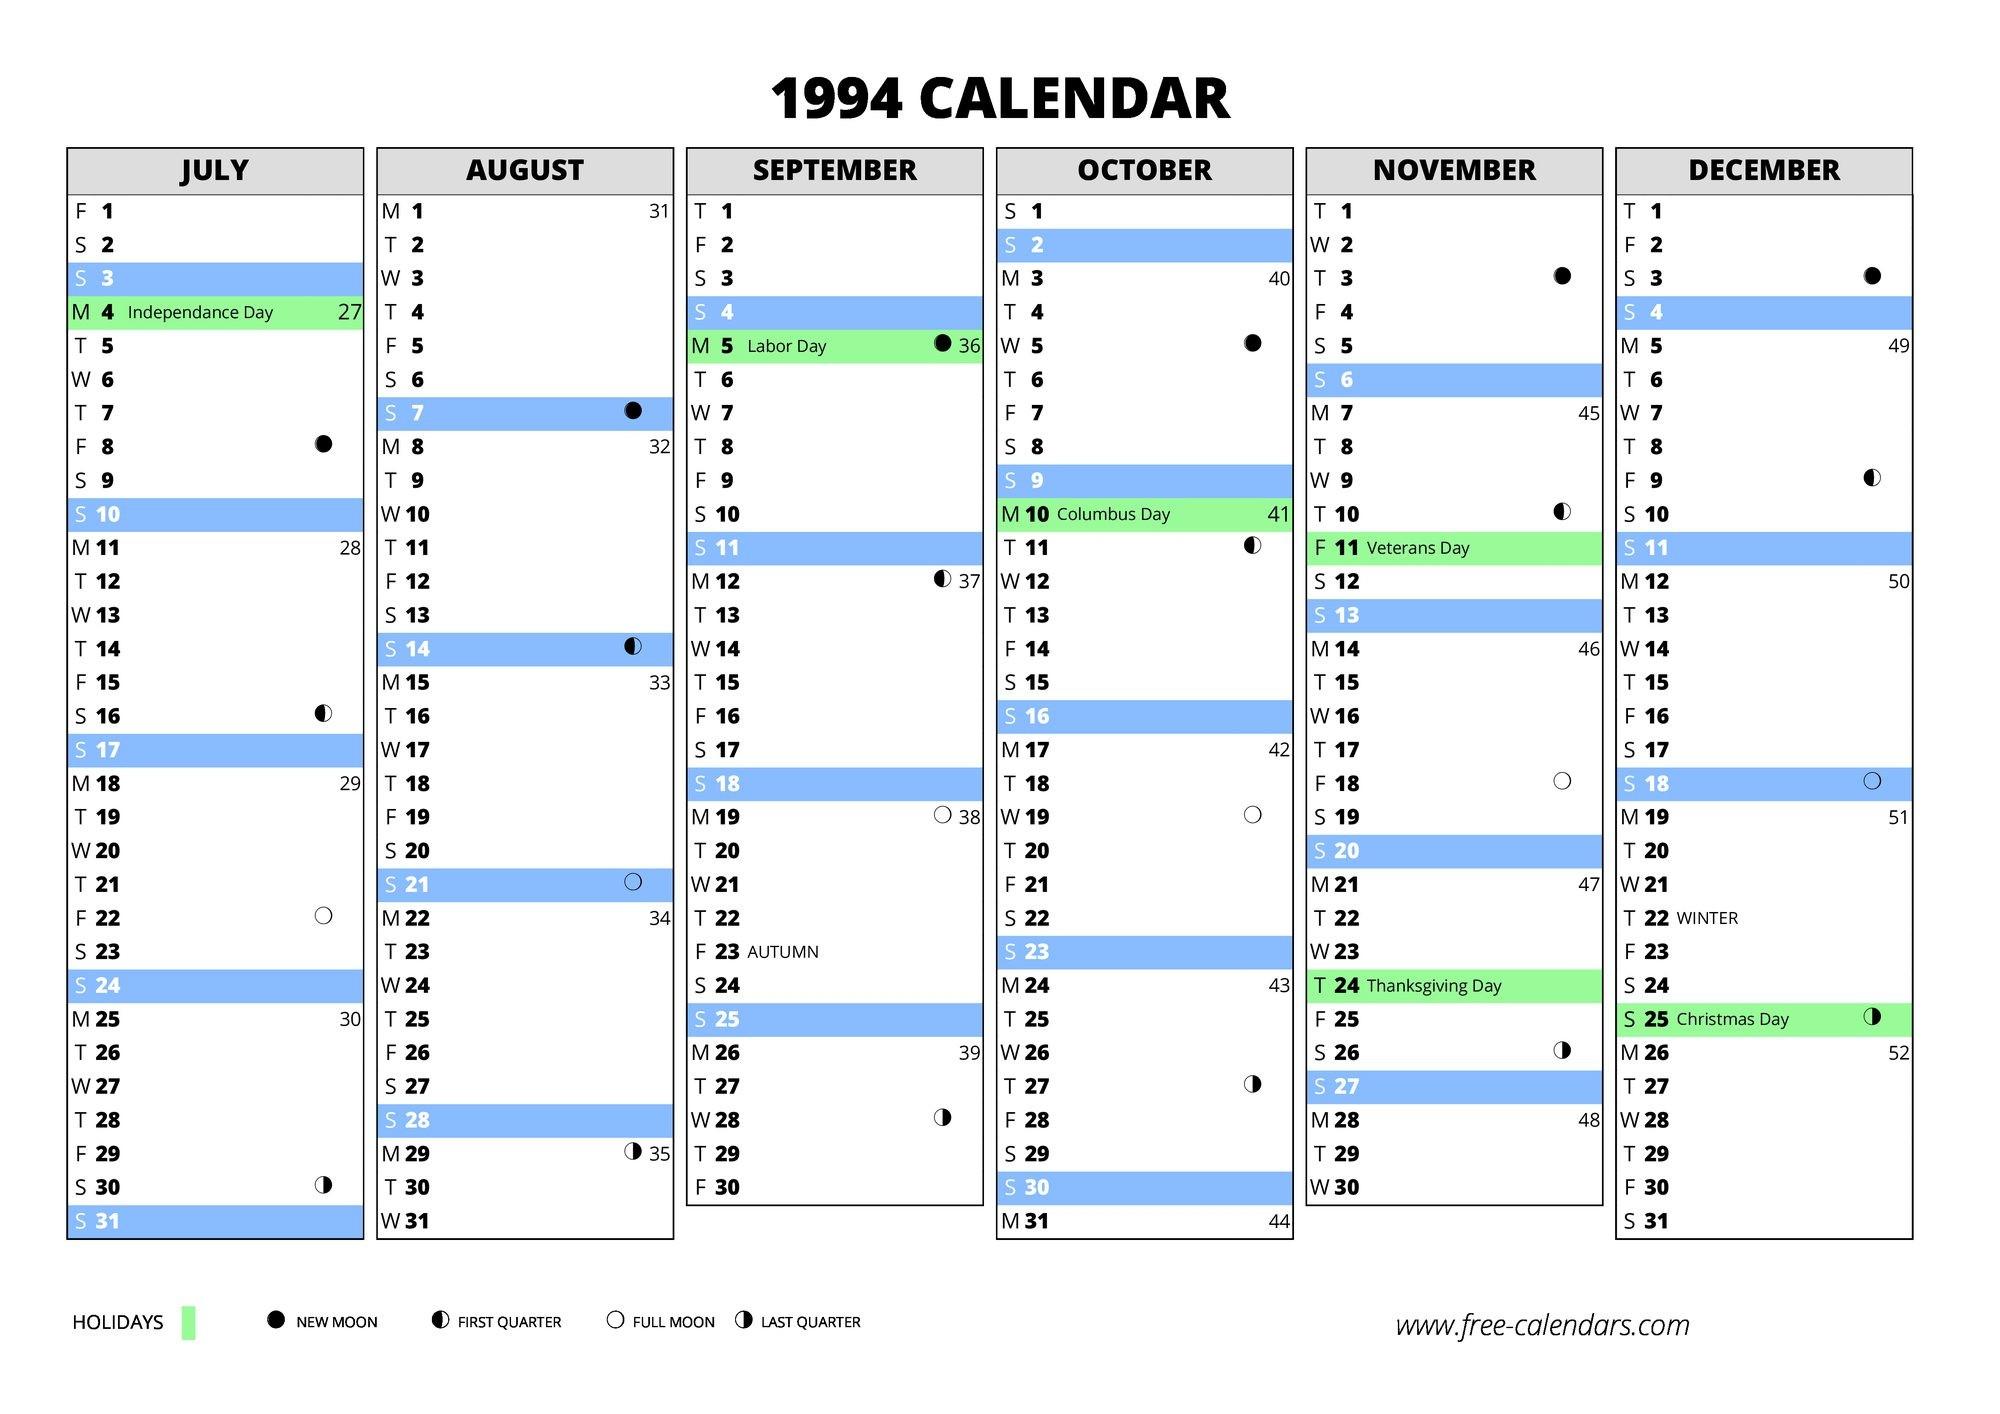 Mathrubhumi Calendar 1994 Pdf Printable Template Incredible December